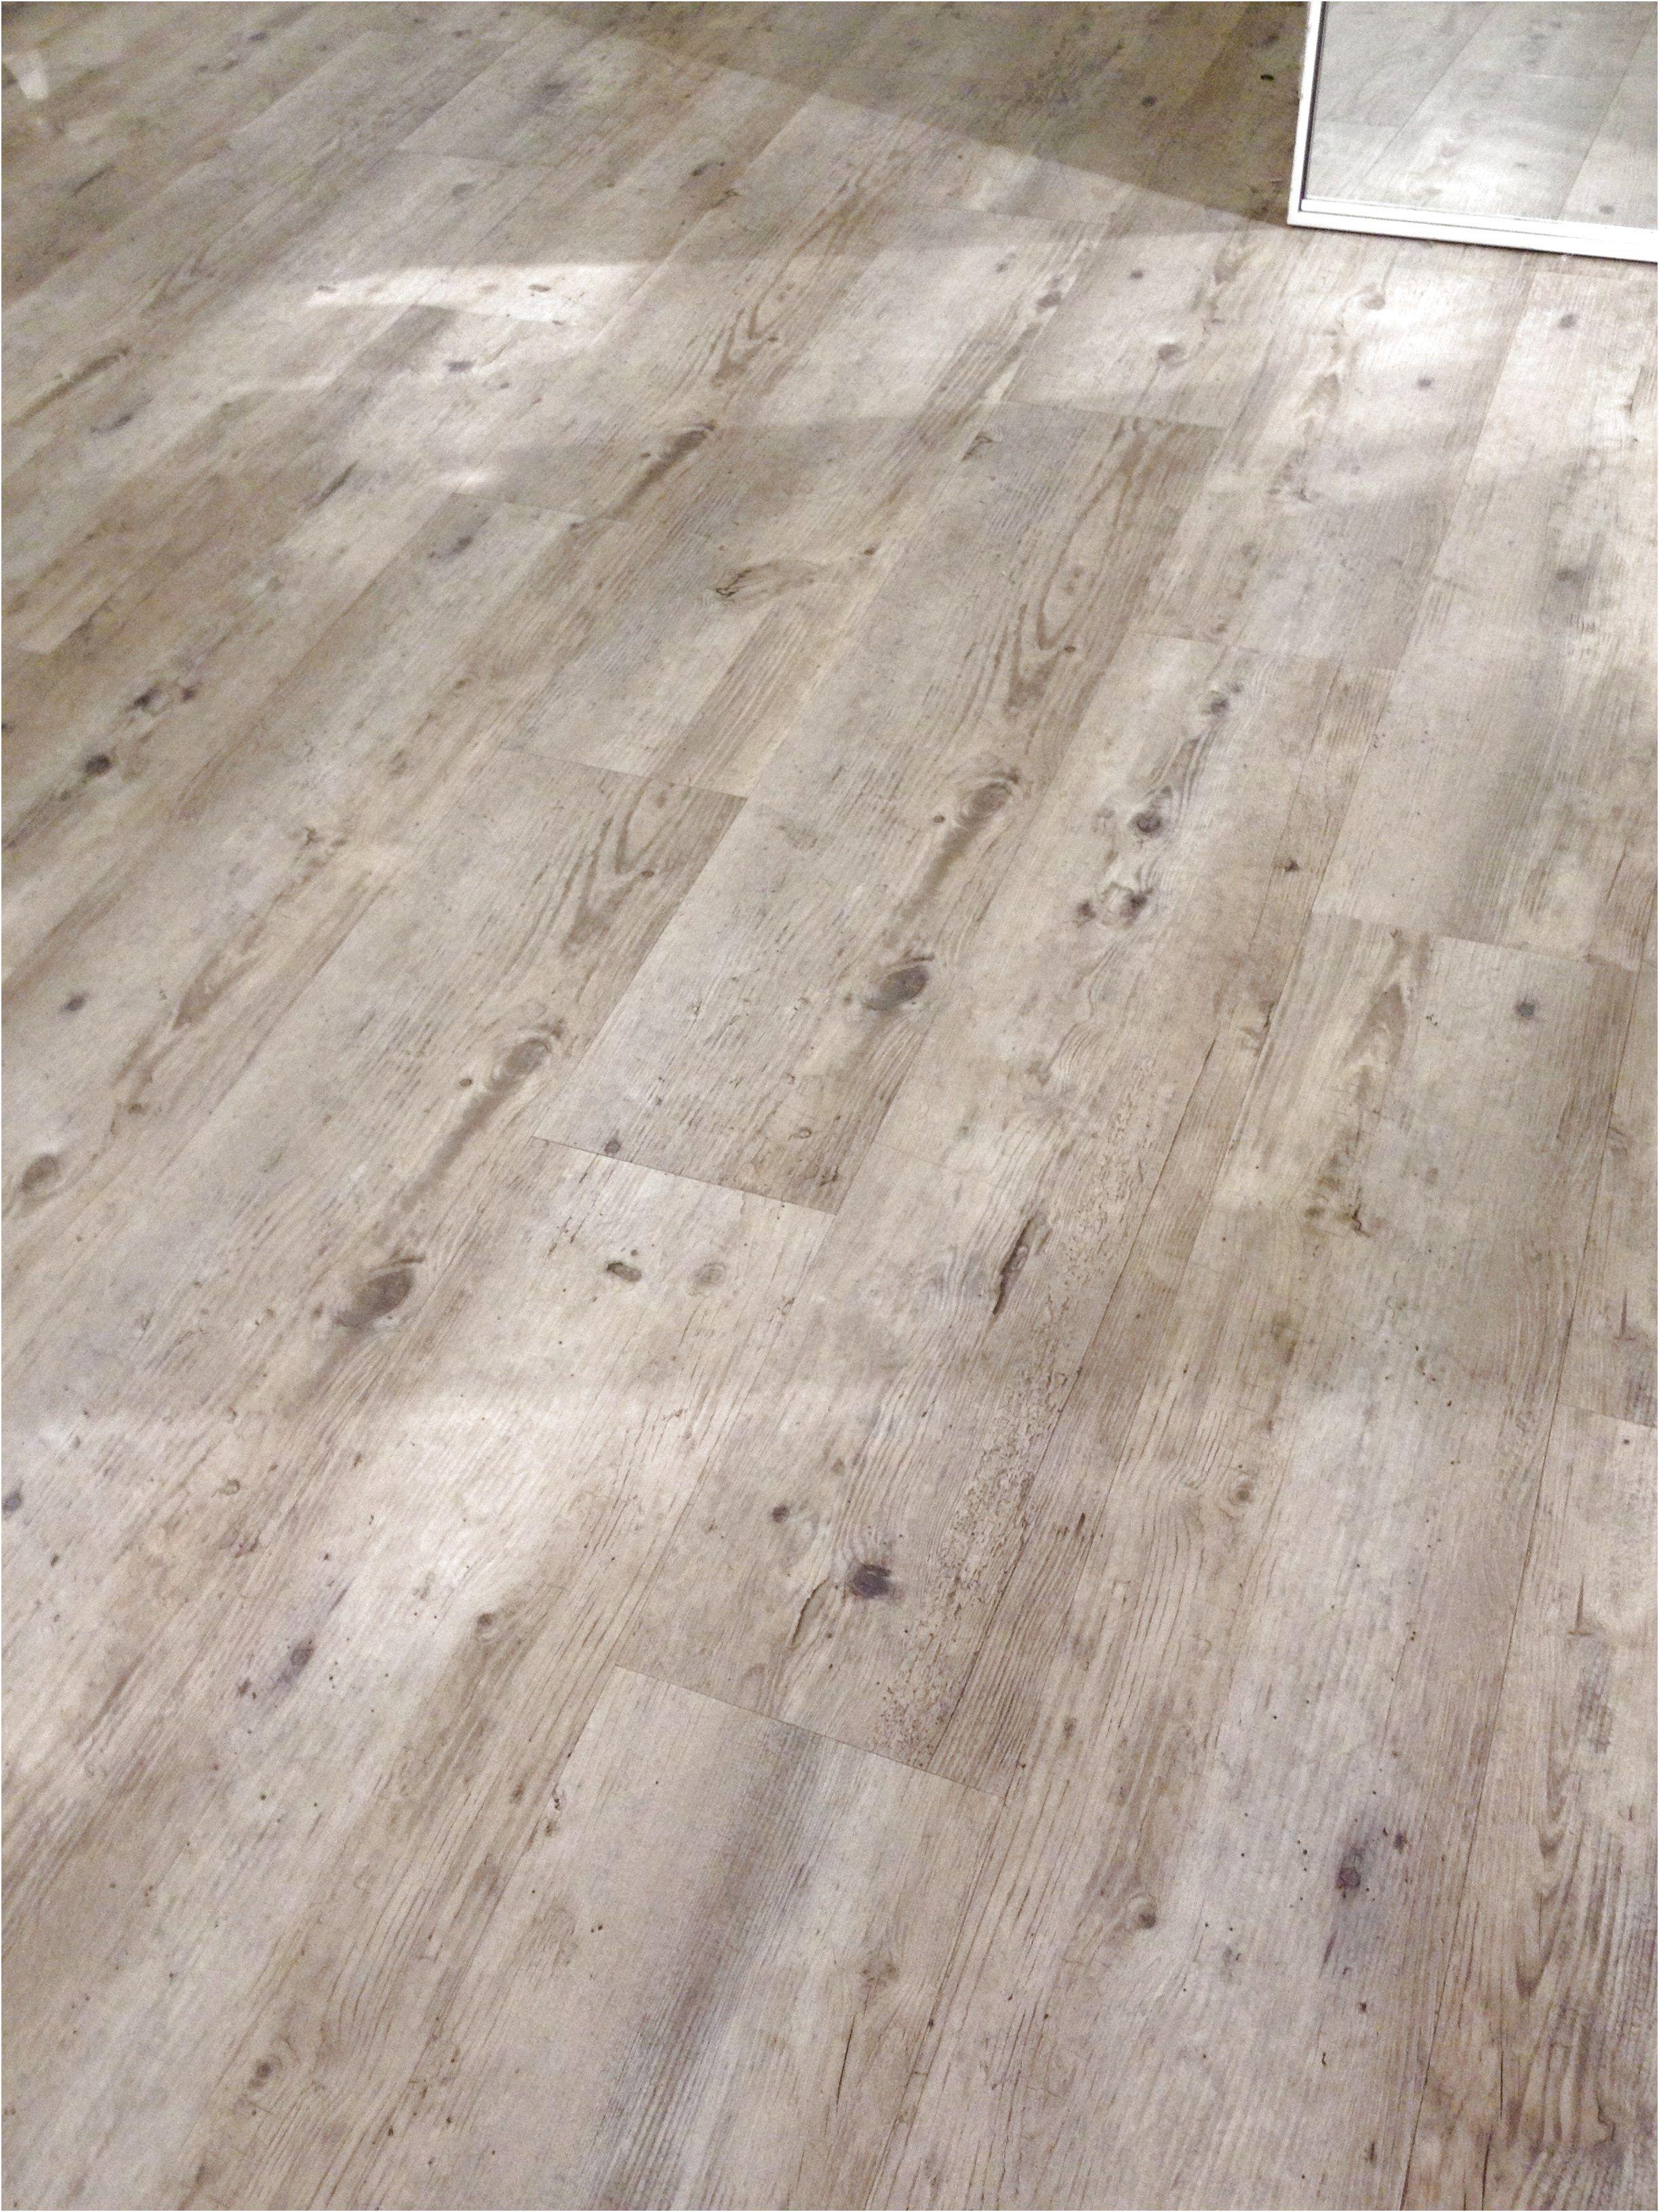 Different Designs For Your Floor Using Ceramics Cement Floor Stained Concrete Concrete Floors